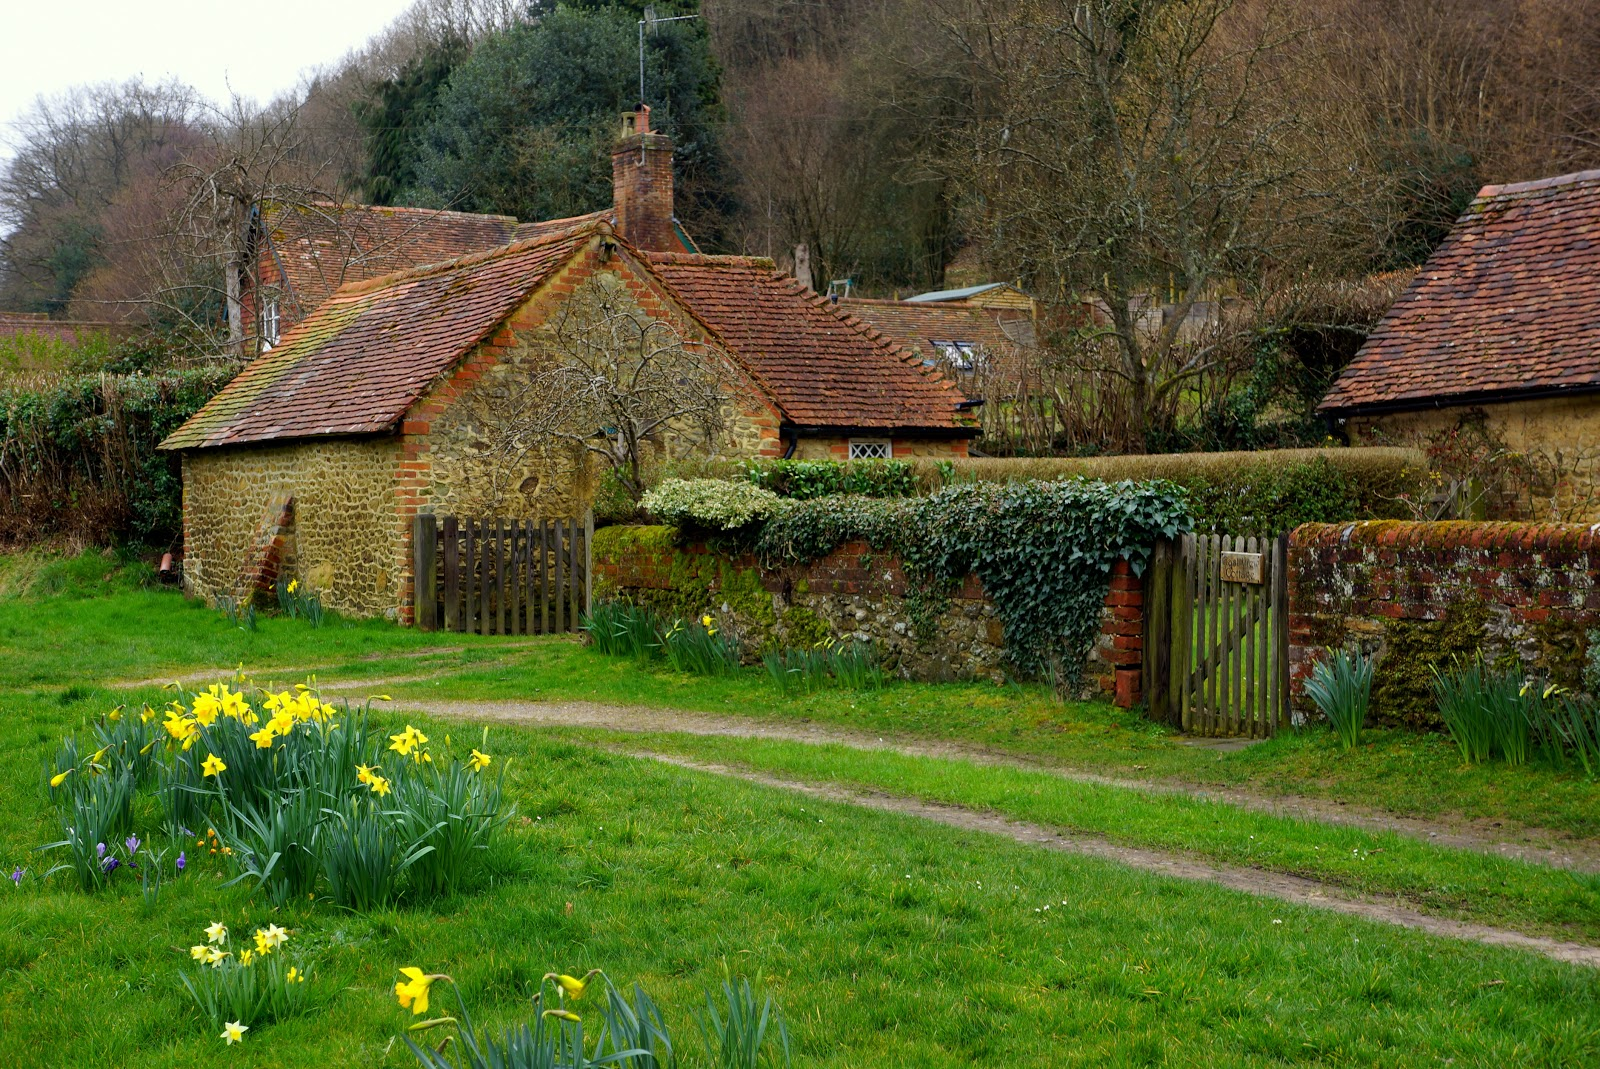 Scotland Old Fashioned Village